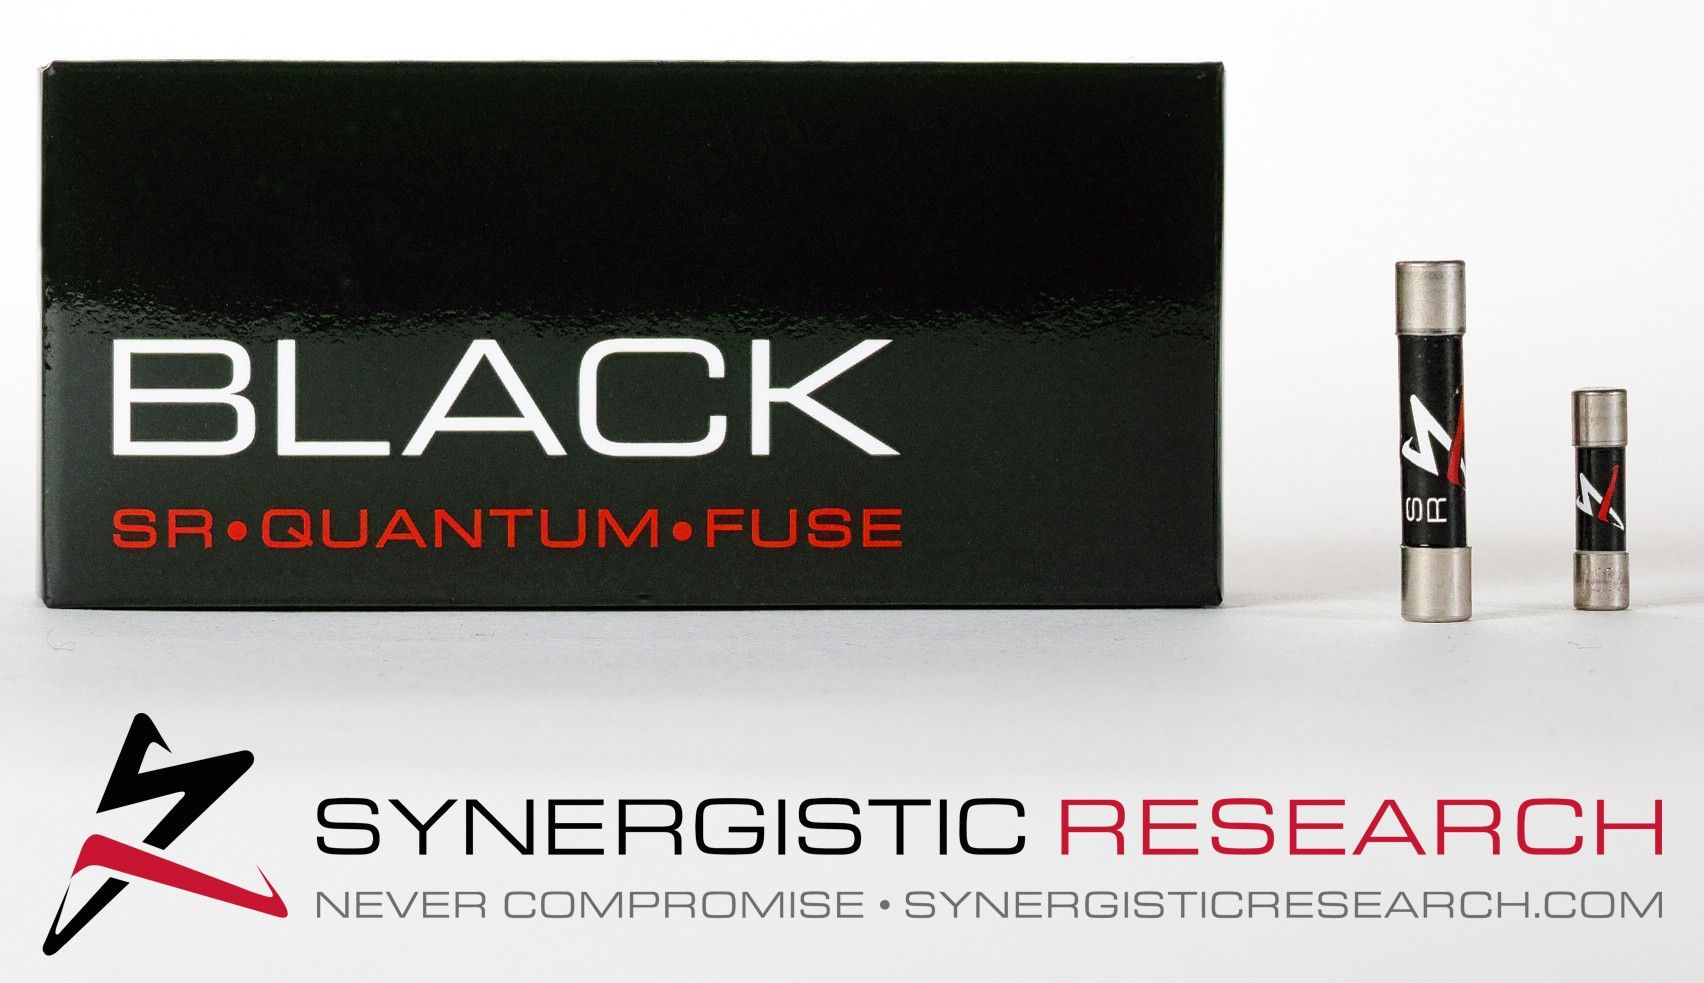 Synergistic Research SR Quantum Black Fuse, 1.6A, Large (6.3mm)